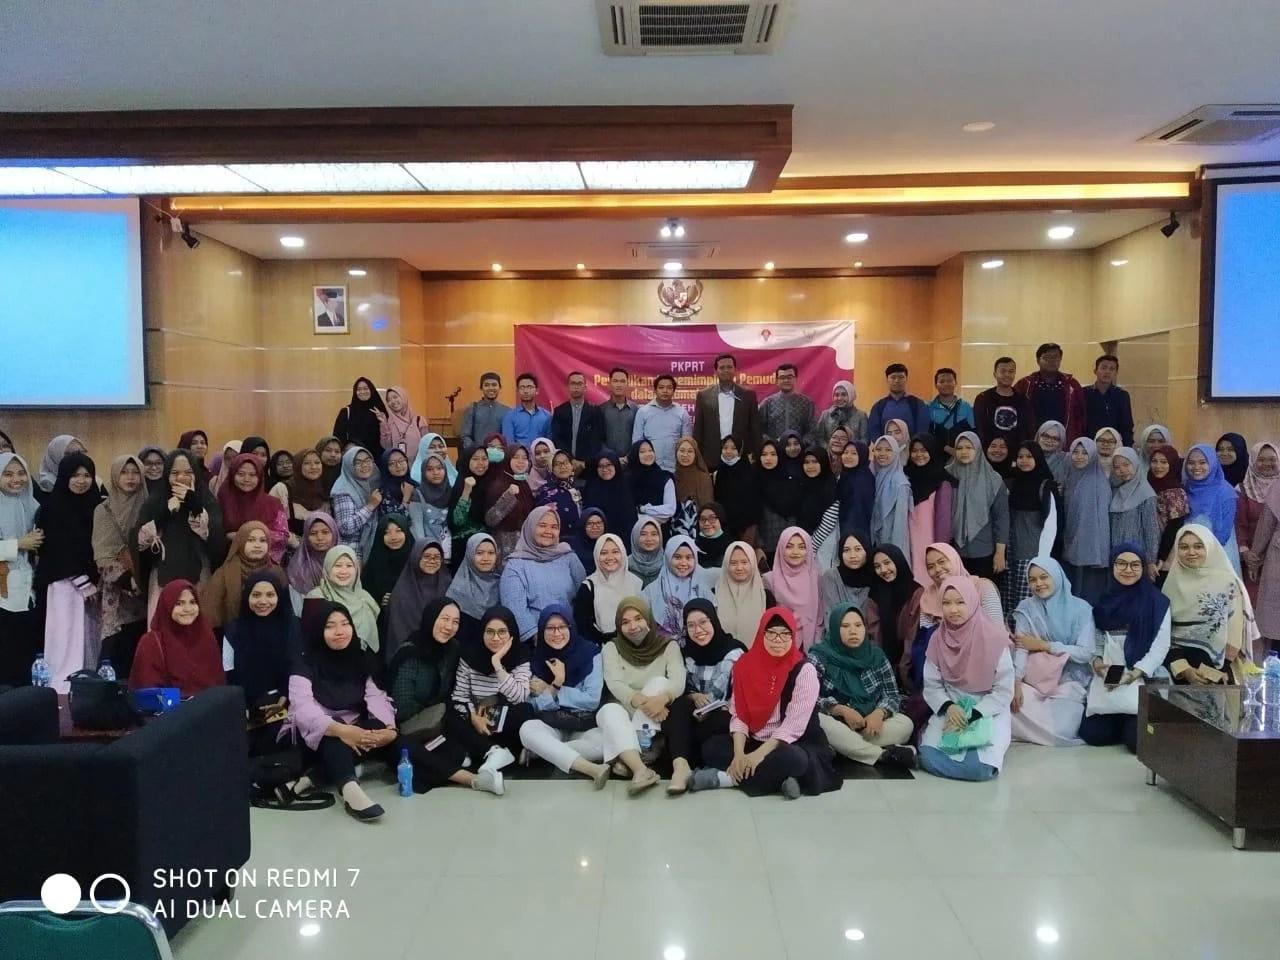 Sambangi Kampus, Kemenpora Lakukan Literasi Pranikah Pada Generasi Muda Muhammadiyah